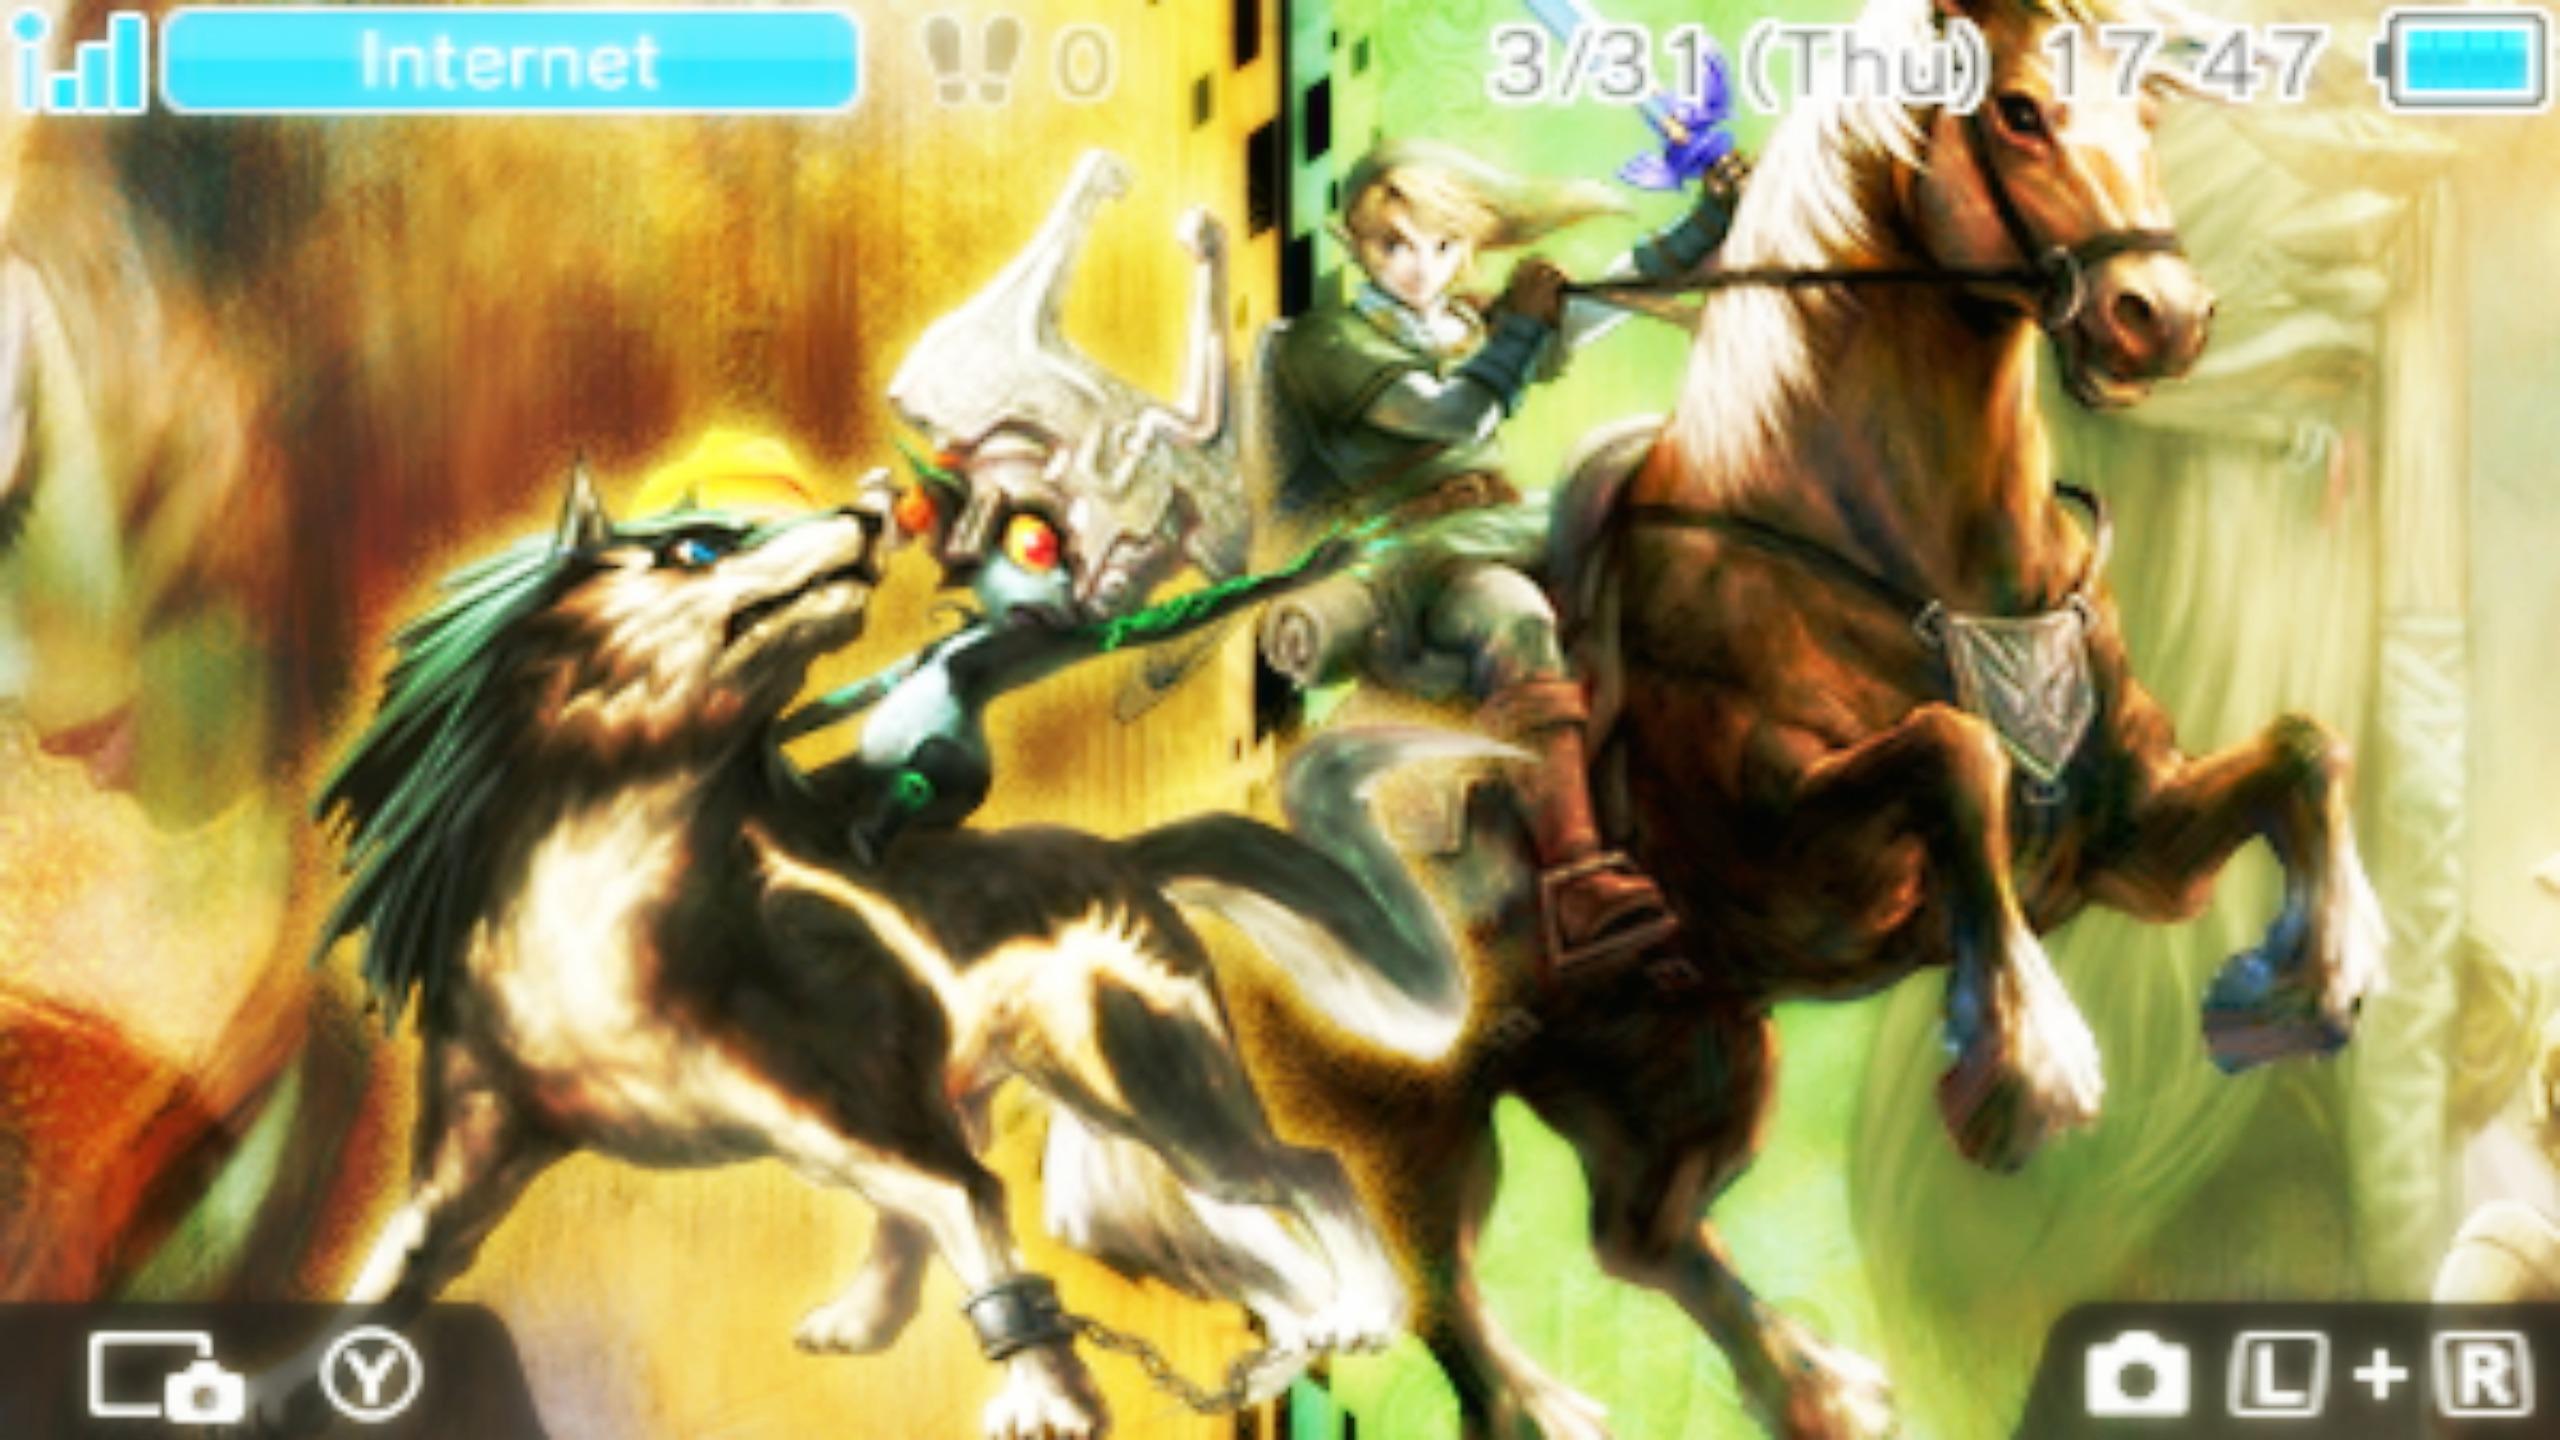 Twilight Princess Hd 3ds Wallpaper 1 By Obsessedgamergal86